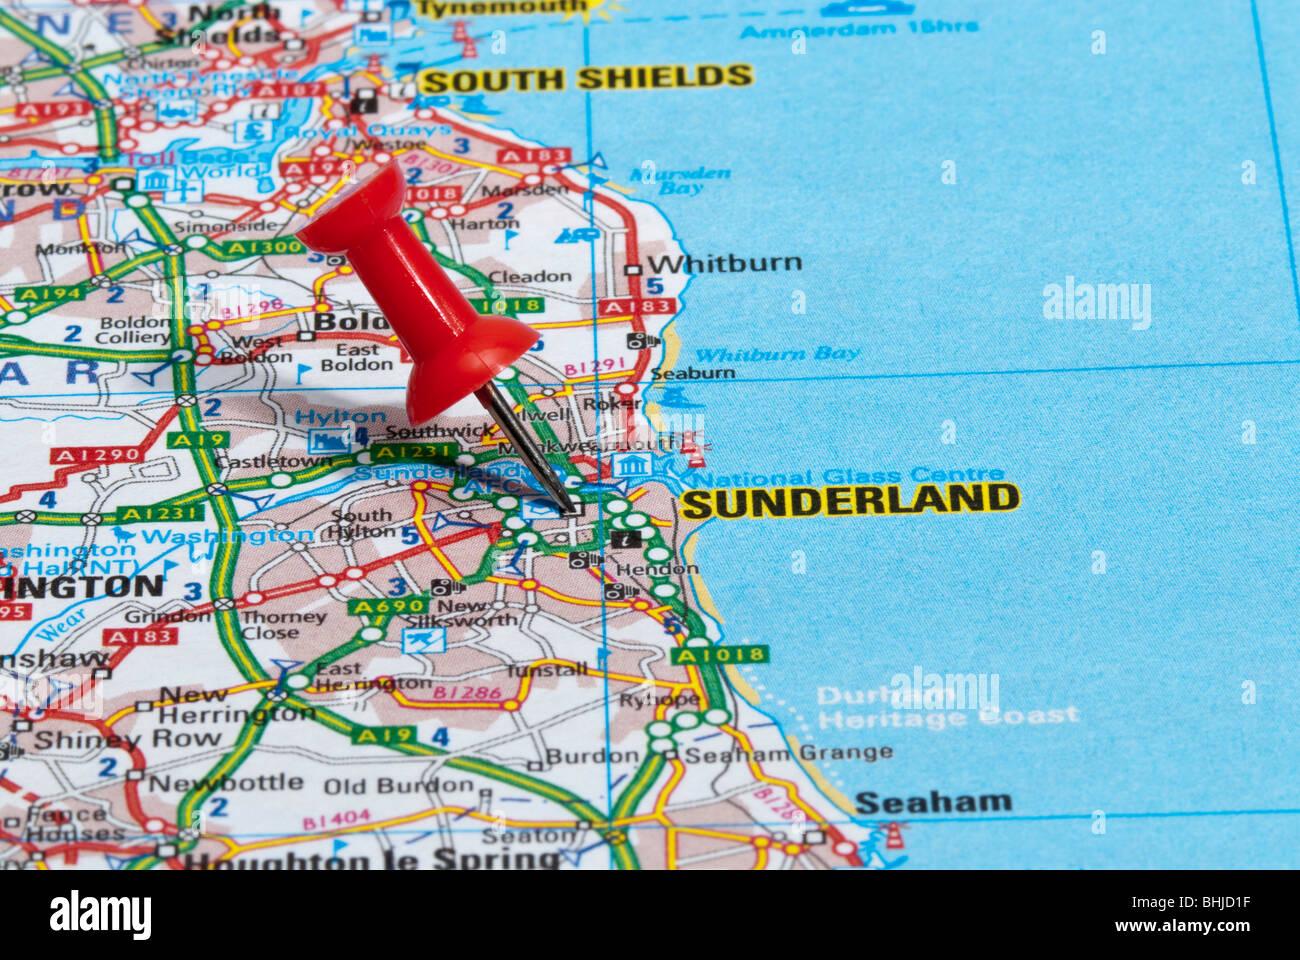 Sunderland Town Centre Stock Photos Sunderland Town Centre Stock